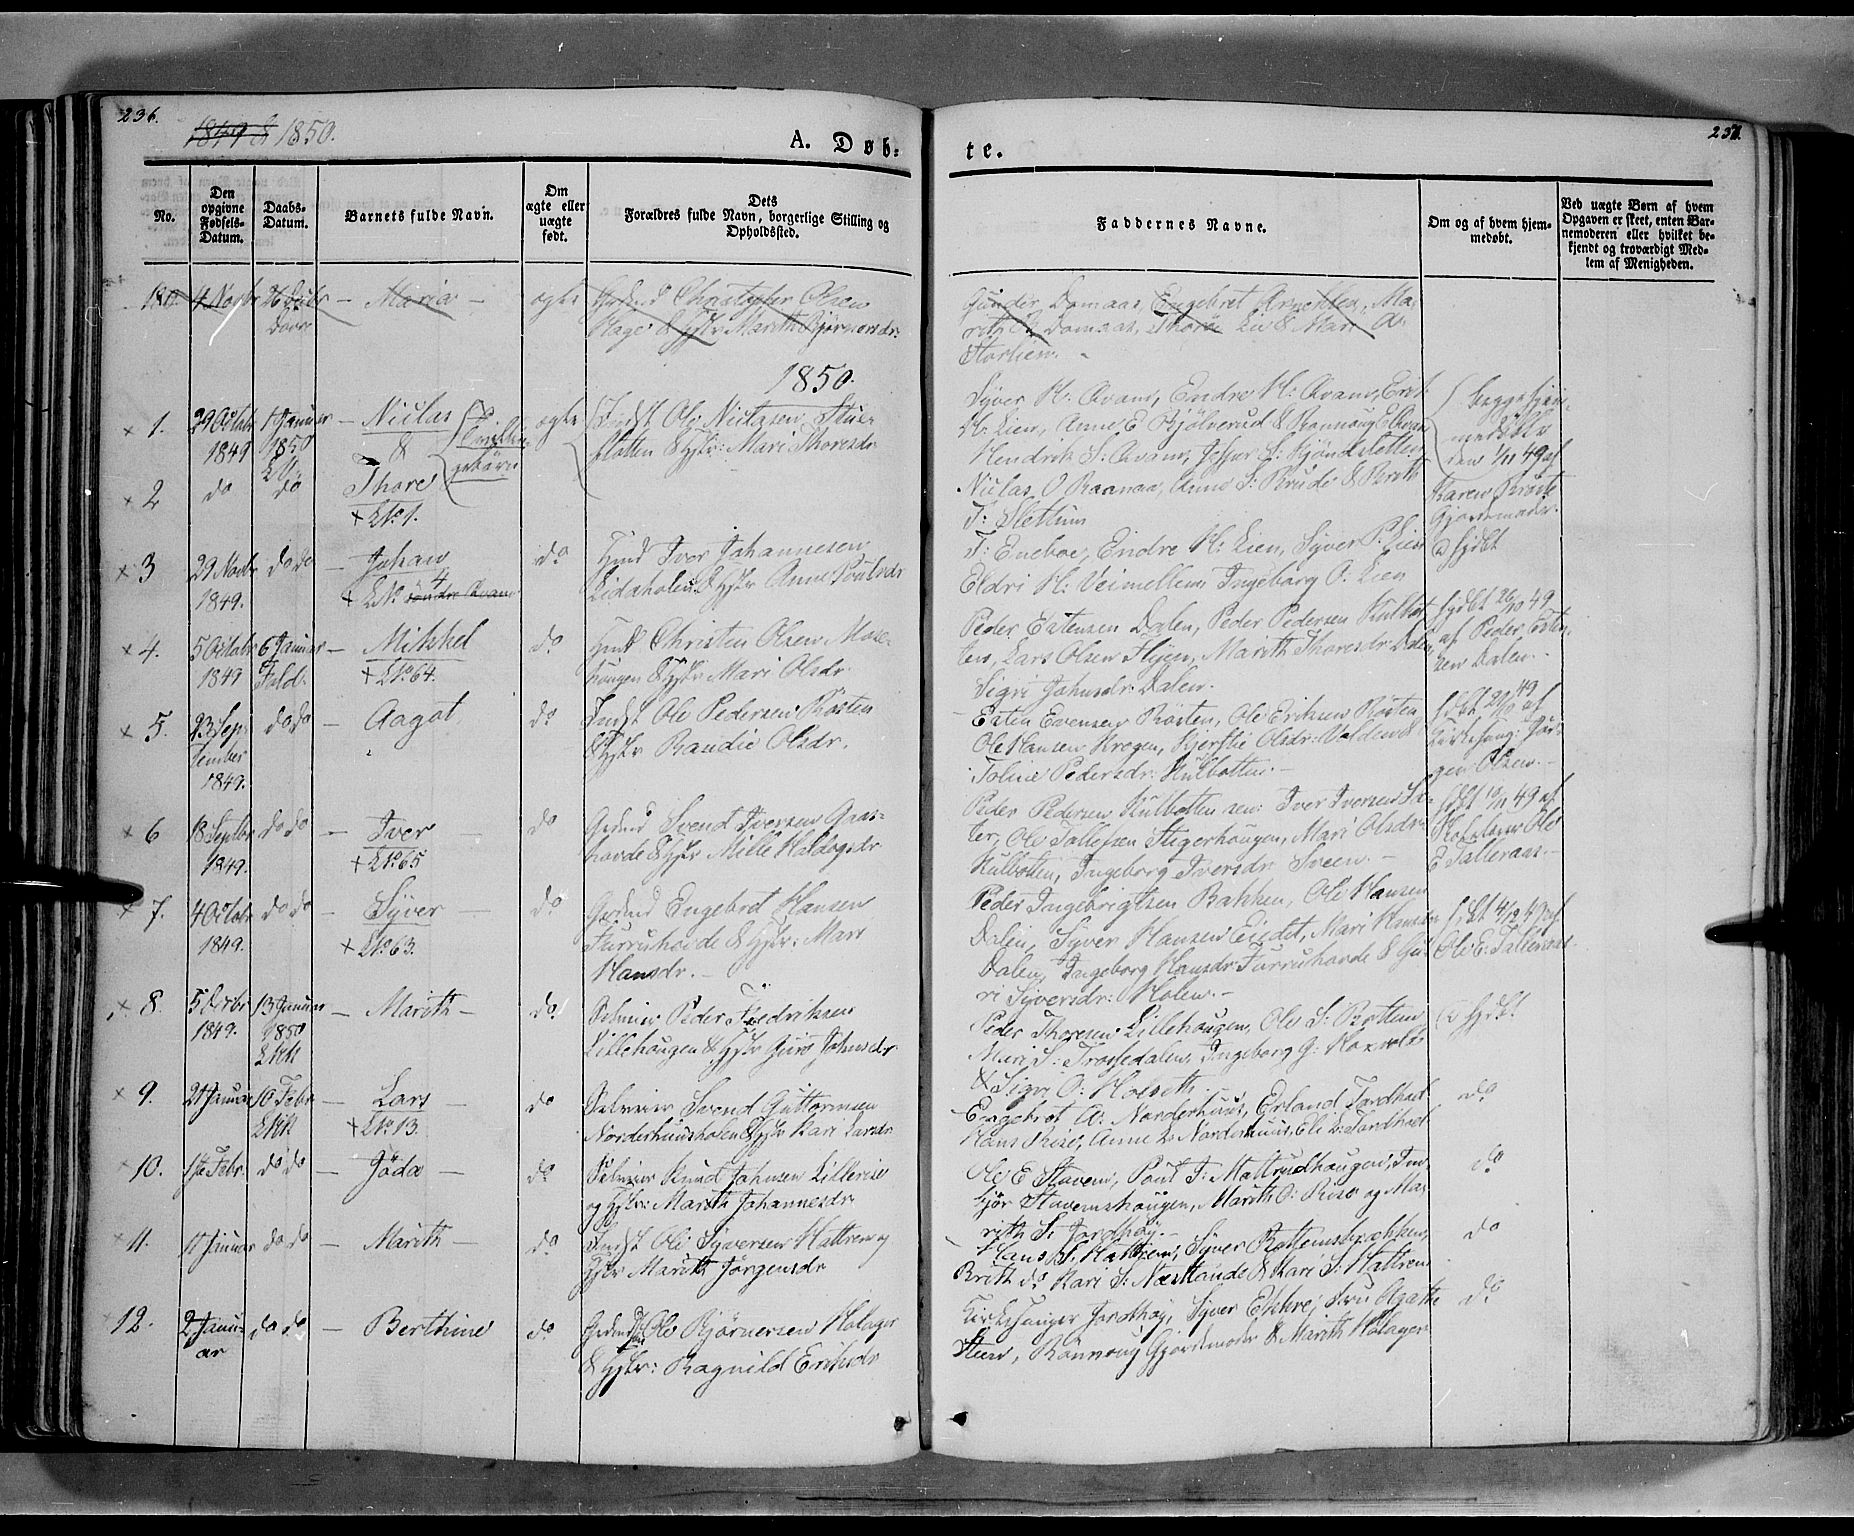 SAH, Lesja prestekontor, Ministerialbok nr. 6A, 1843-1854, s. 236-237